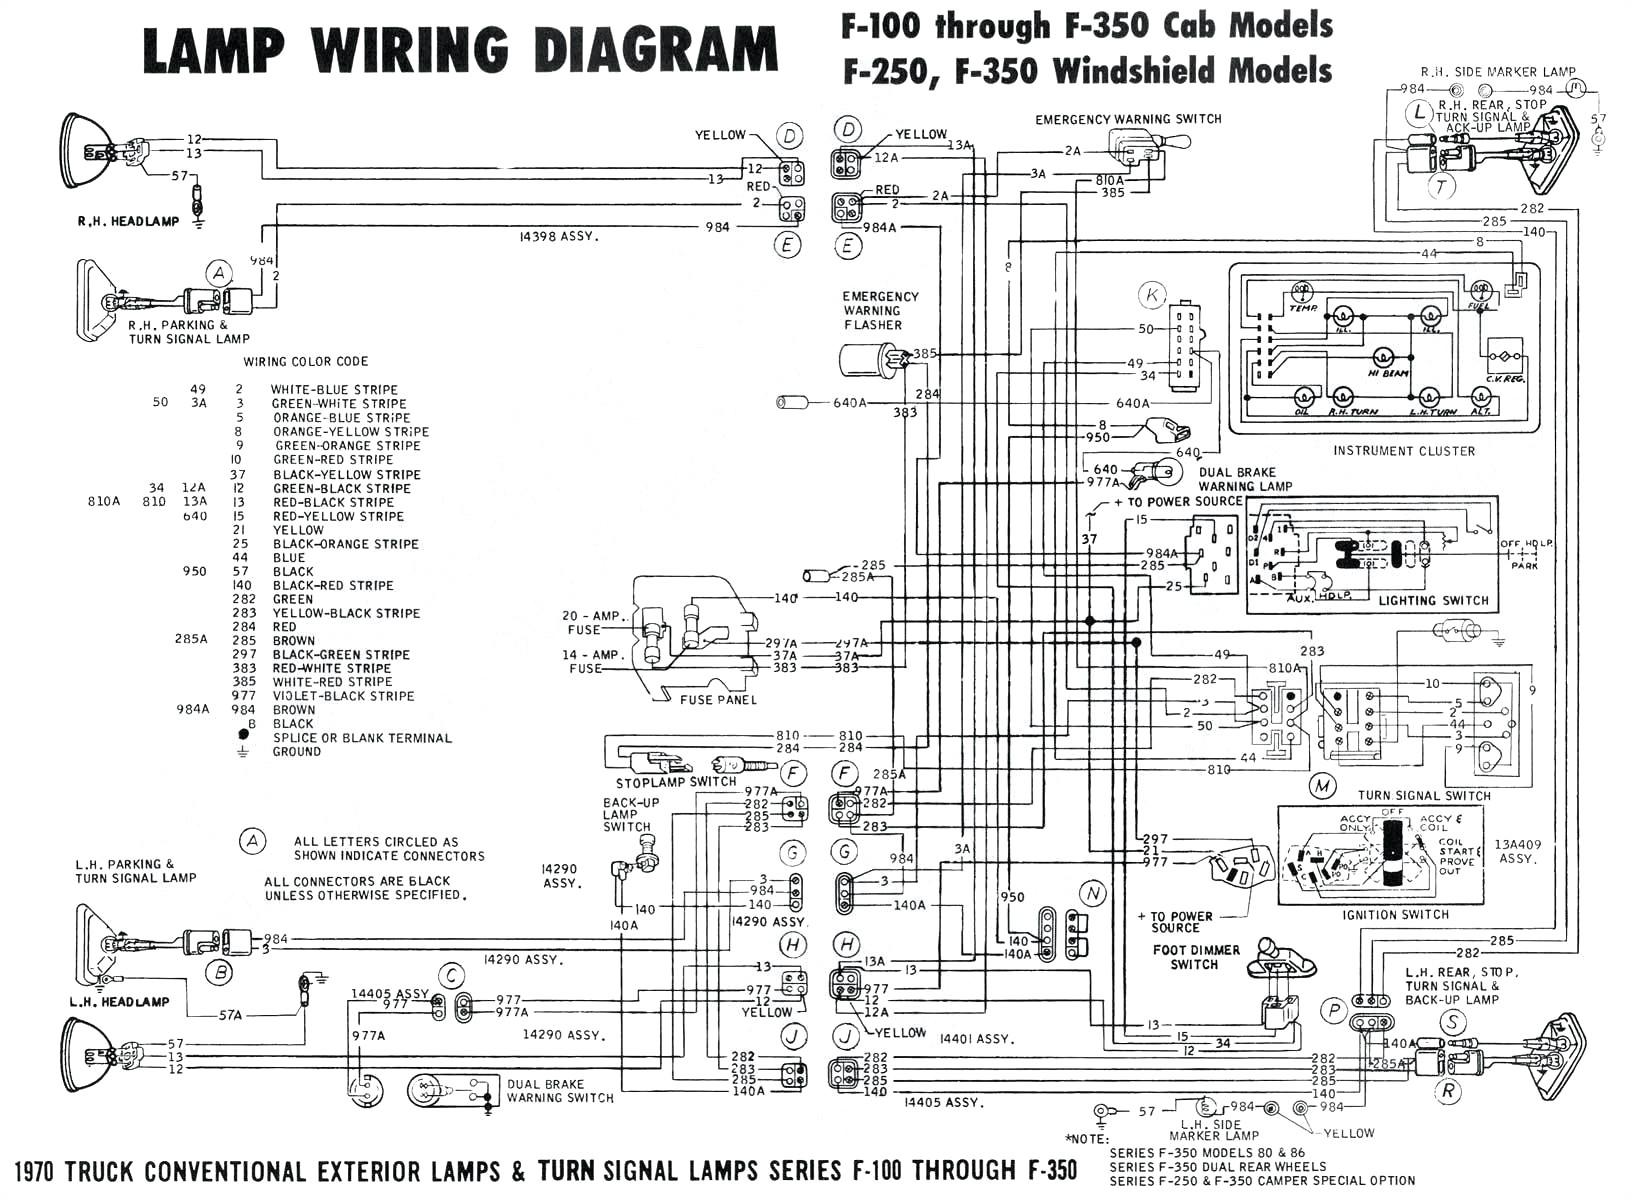 logitech z 340 wiring diagram inspirational 2004 avalanche ignition wiring diagram basic wiring diagram